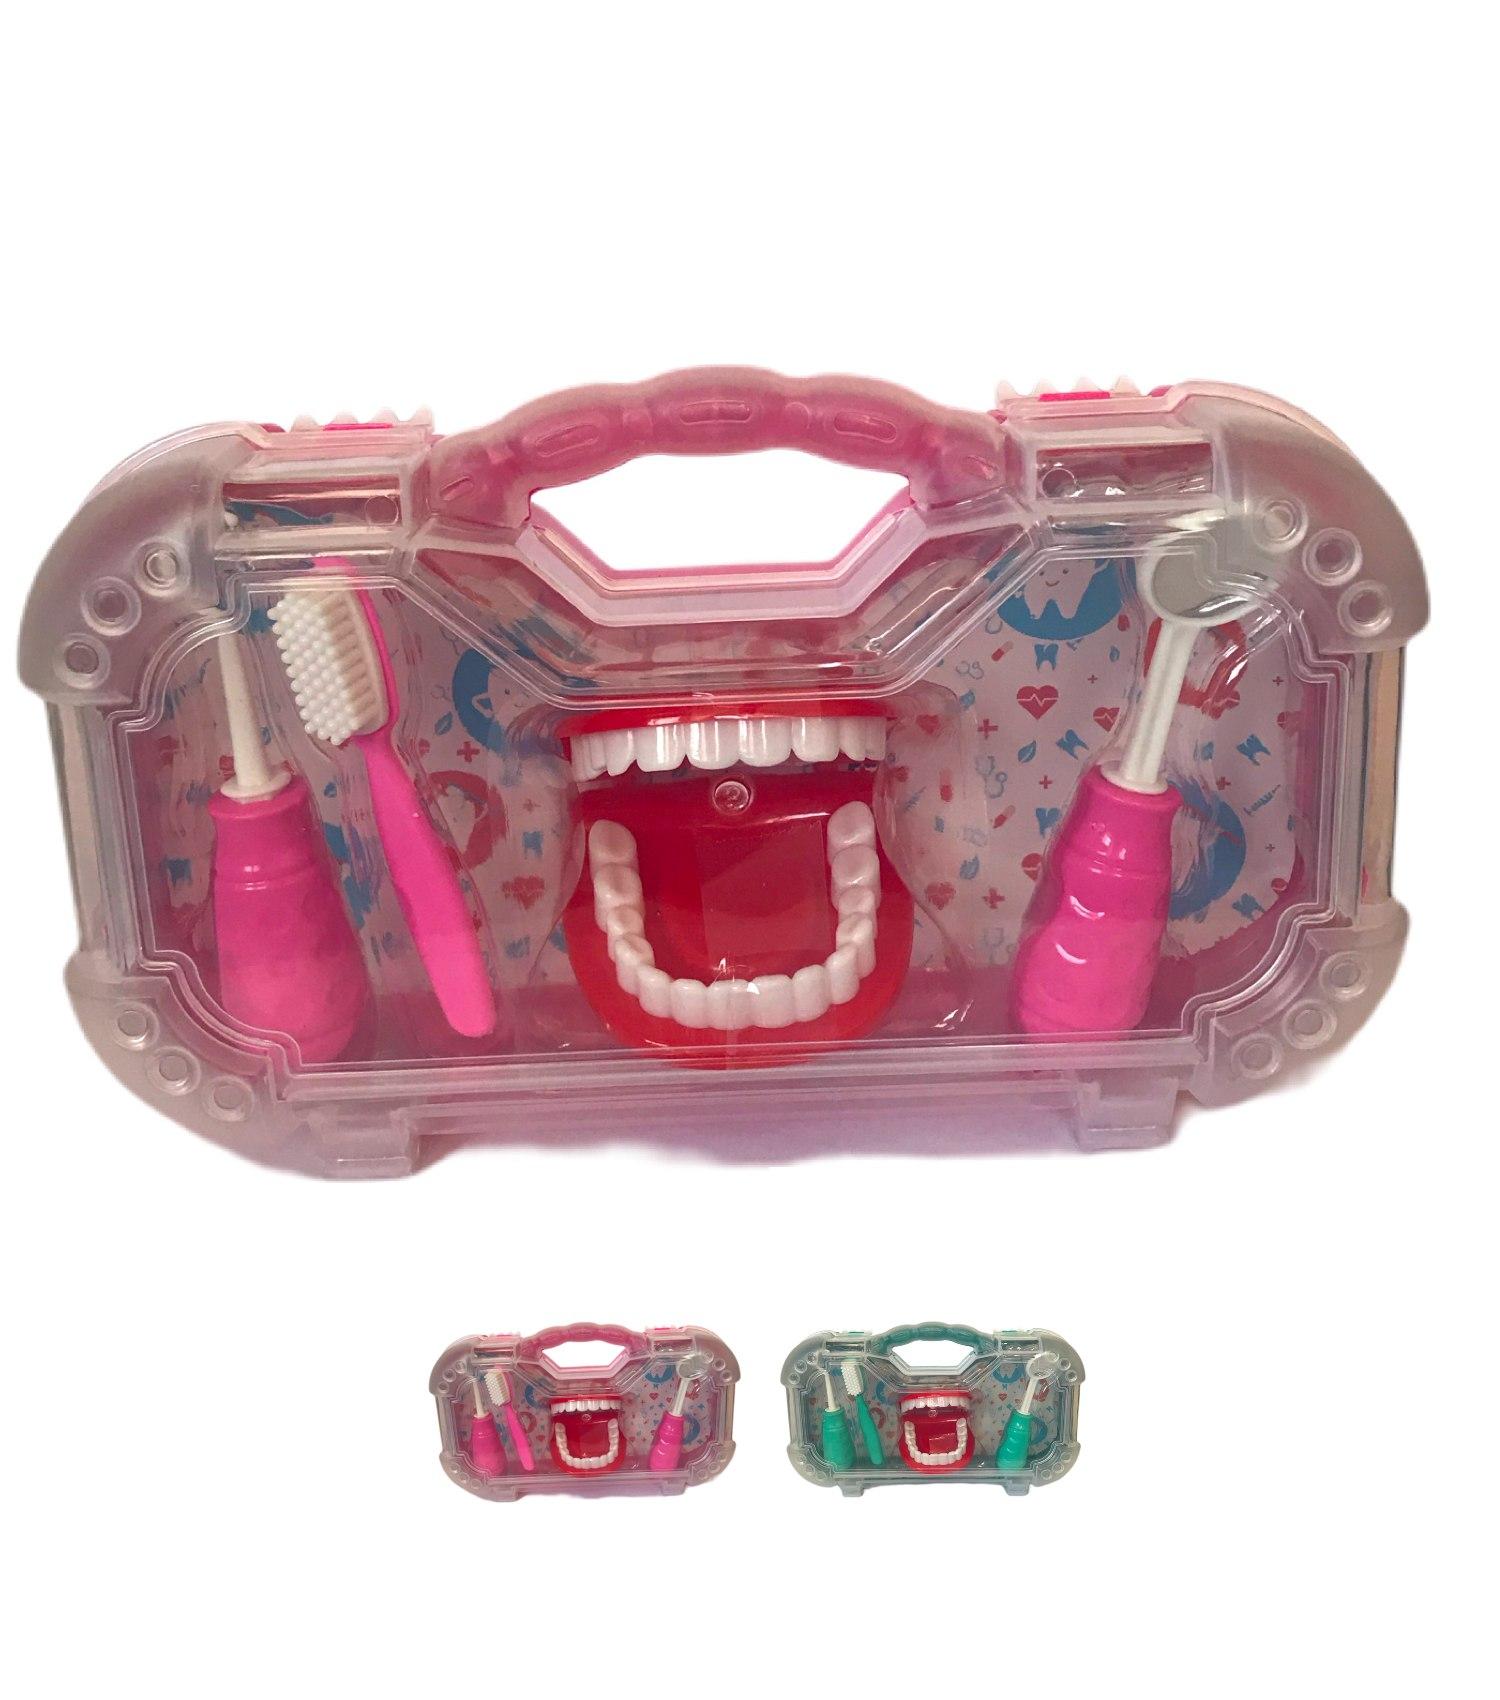 Brinquedo Maleta Dentista Educativo Pakitoys